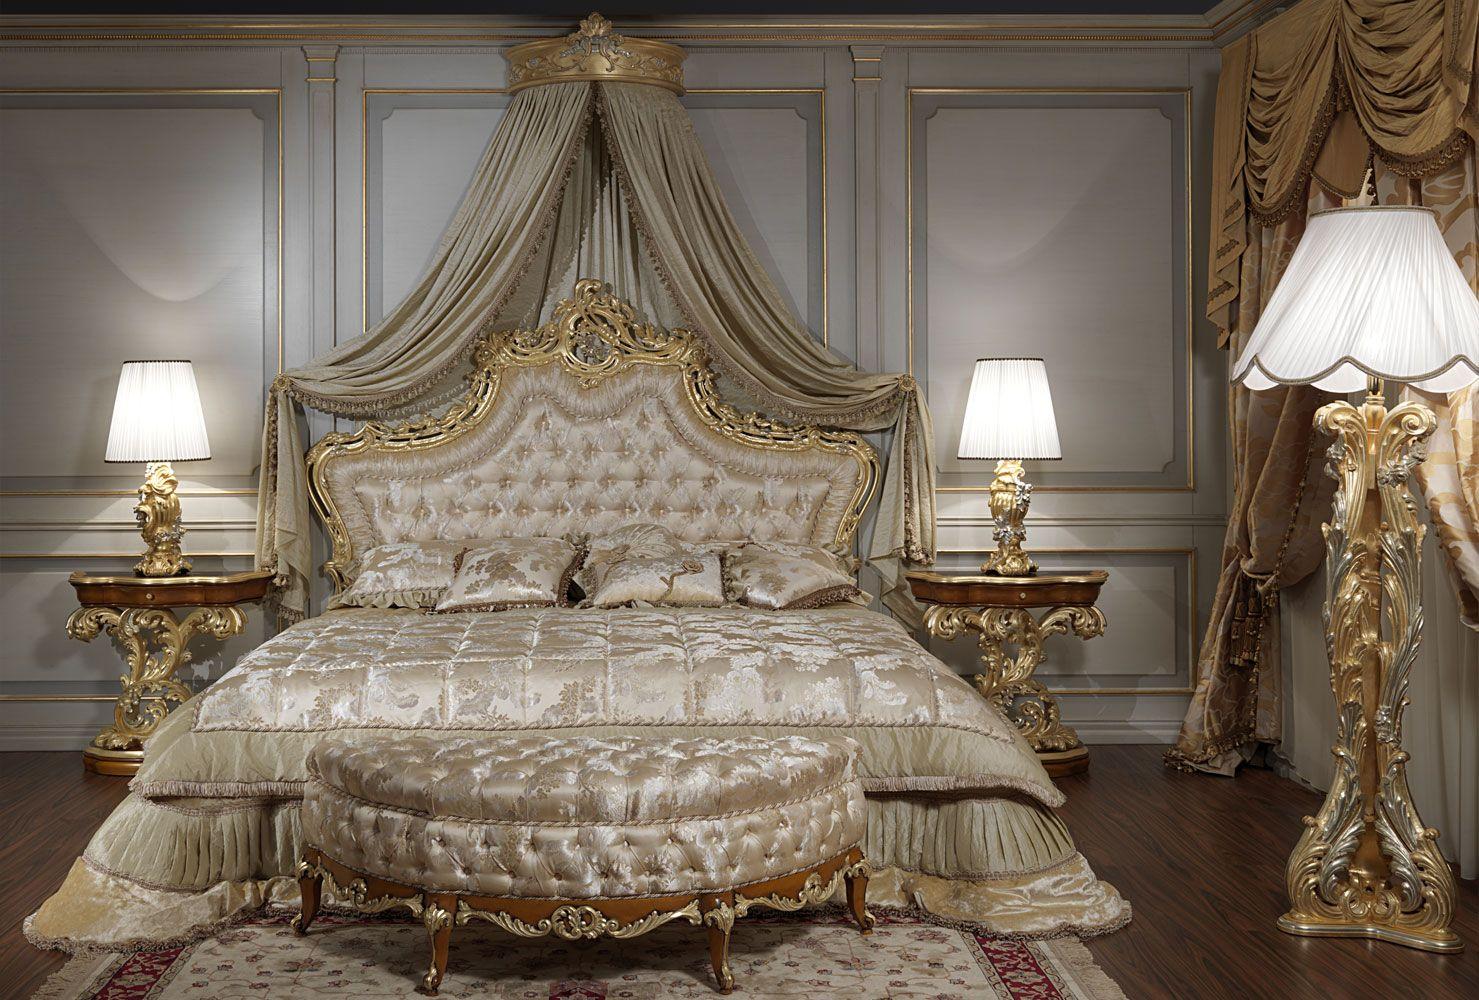 Luxury Classic Bedroom Roman Baroque Style Of The Seventeenth